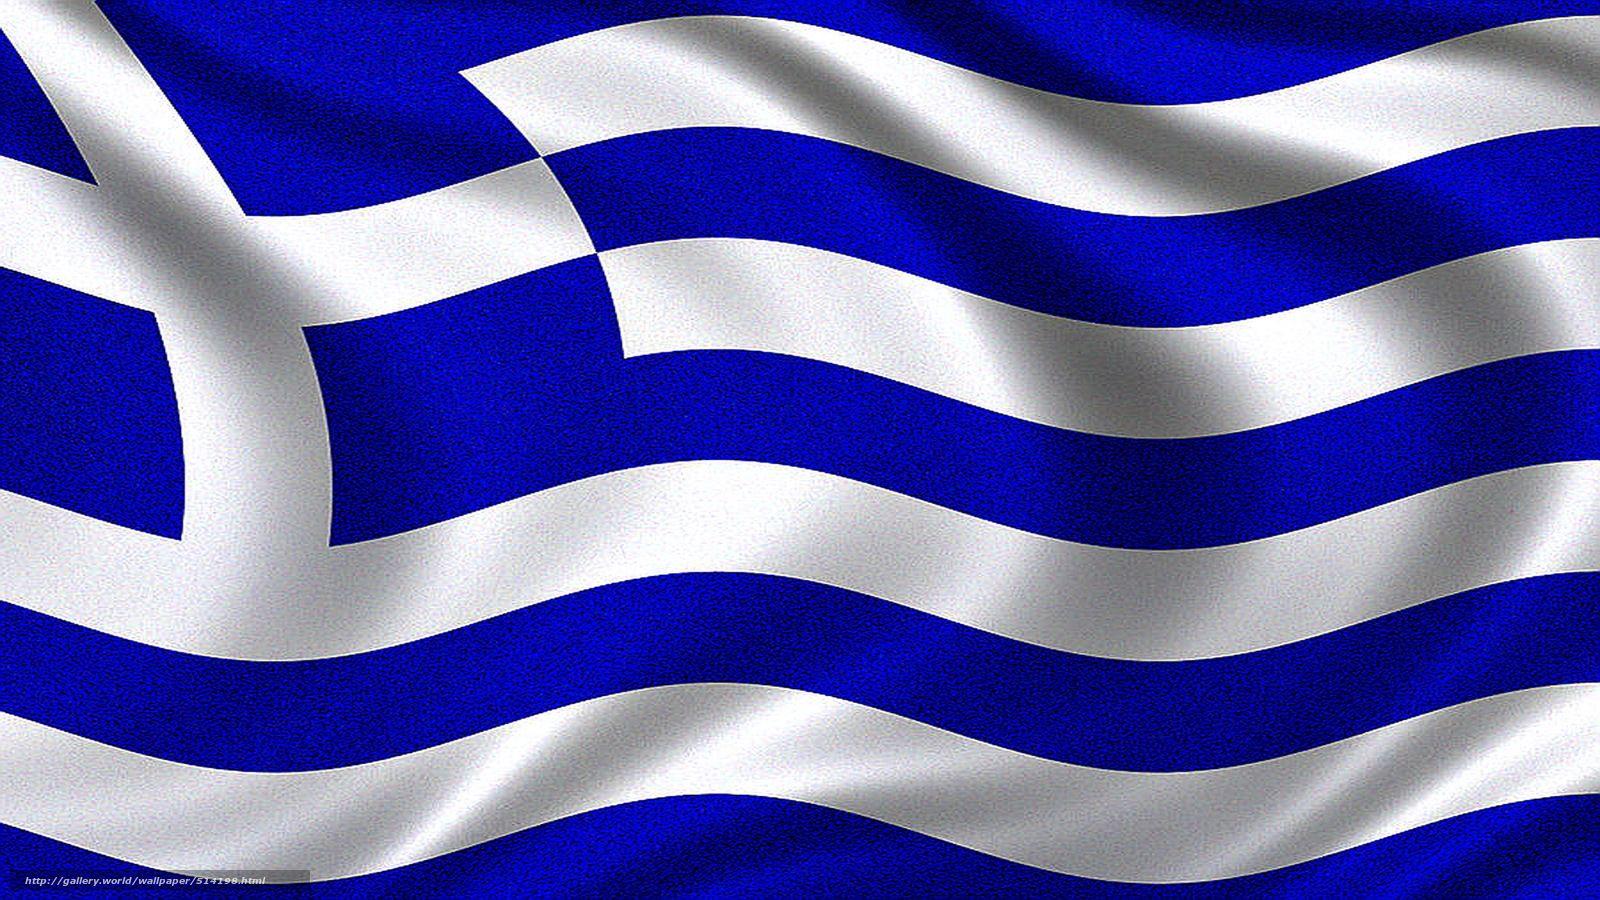 greek flag wallpaper hd wallpapers pinterest greek